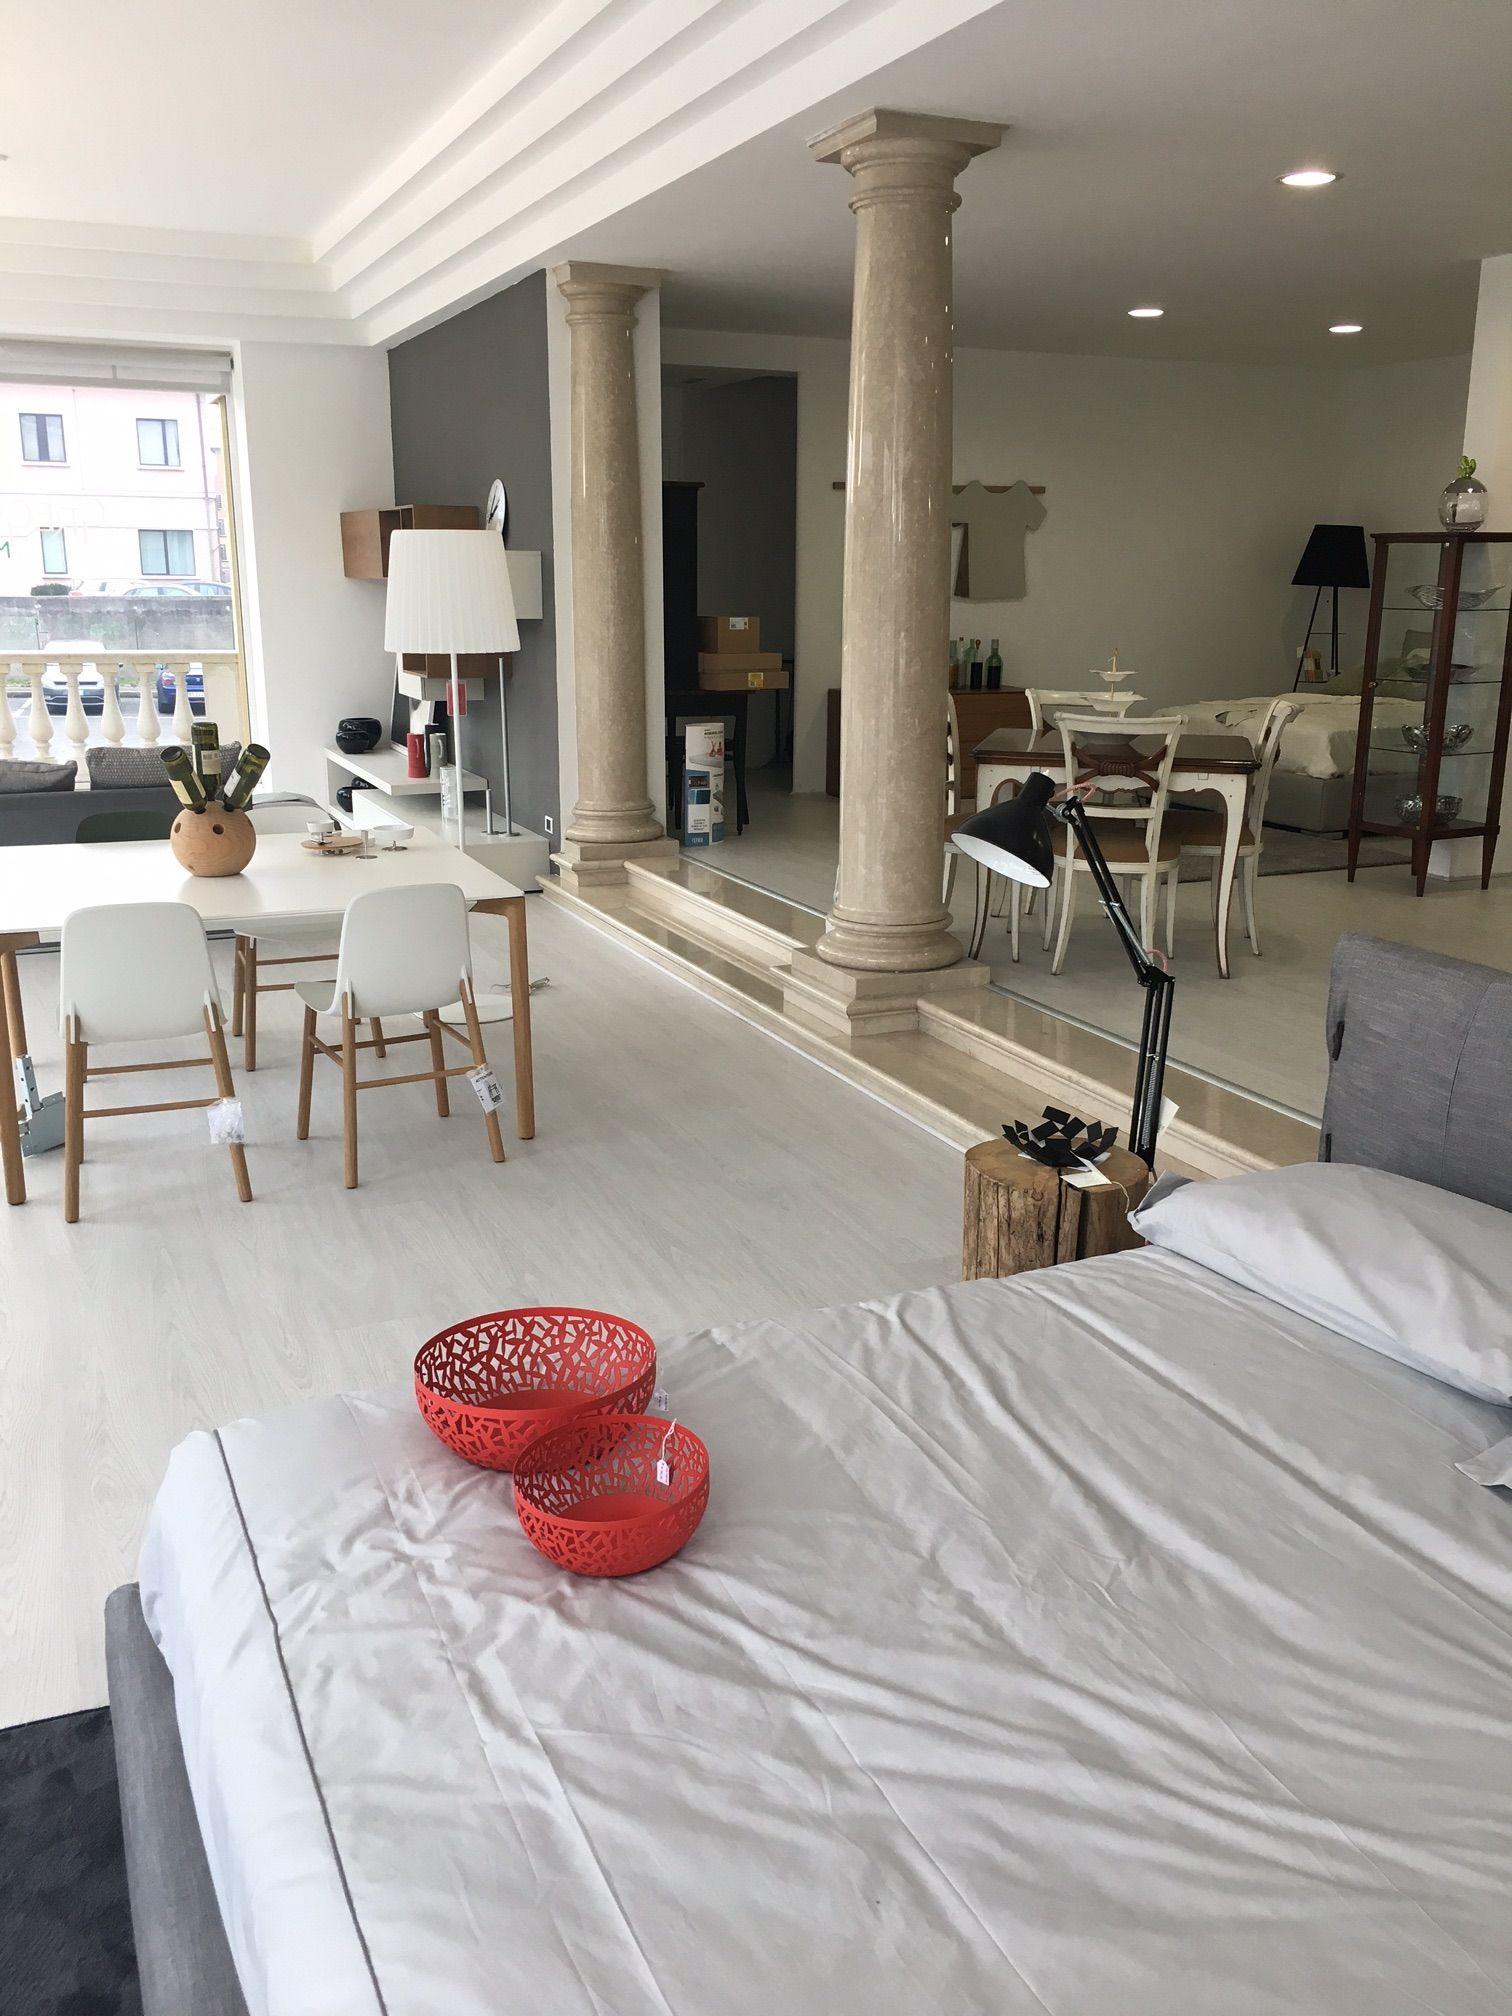 Some ideas at gregori mobili villa sarcina bs look at for Malerba mobili